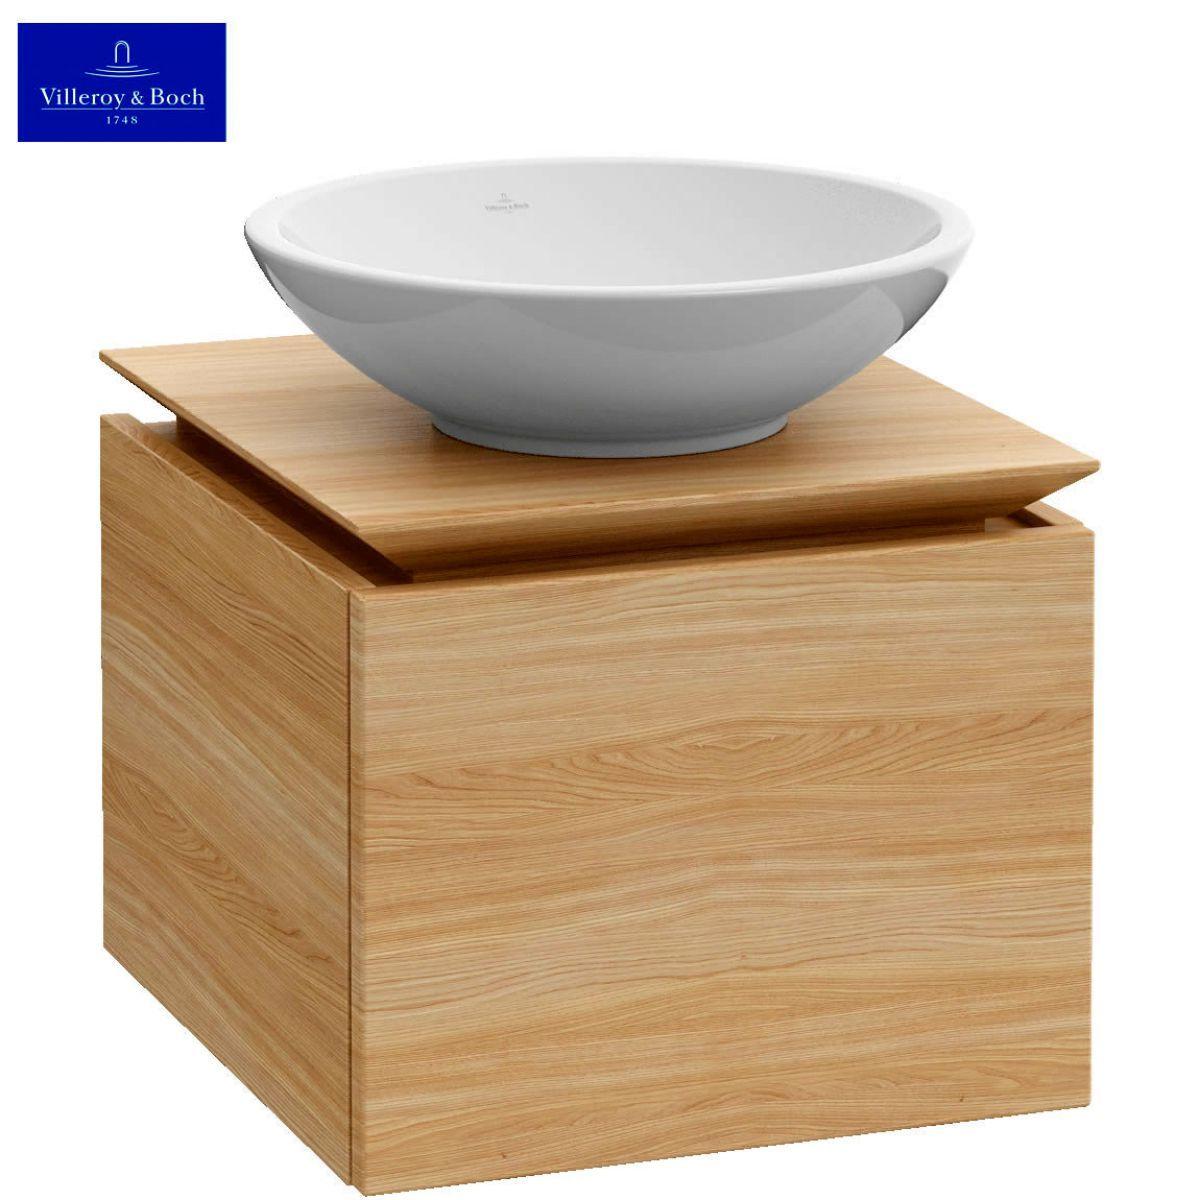 Villeroy and boch bathroom cabinets - Villeroy Boch Legato 450mm In Elm Impresso